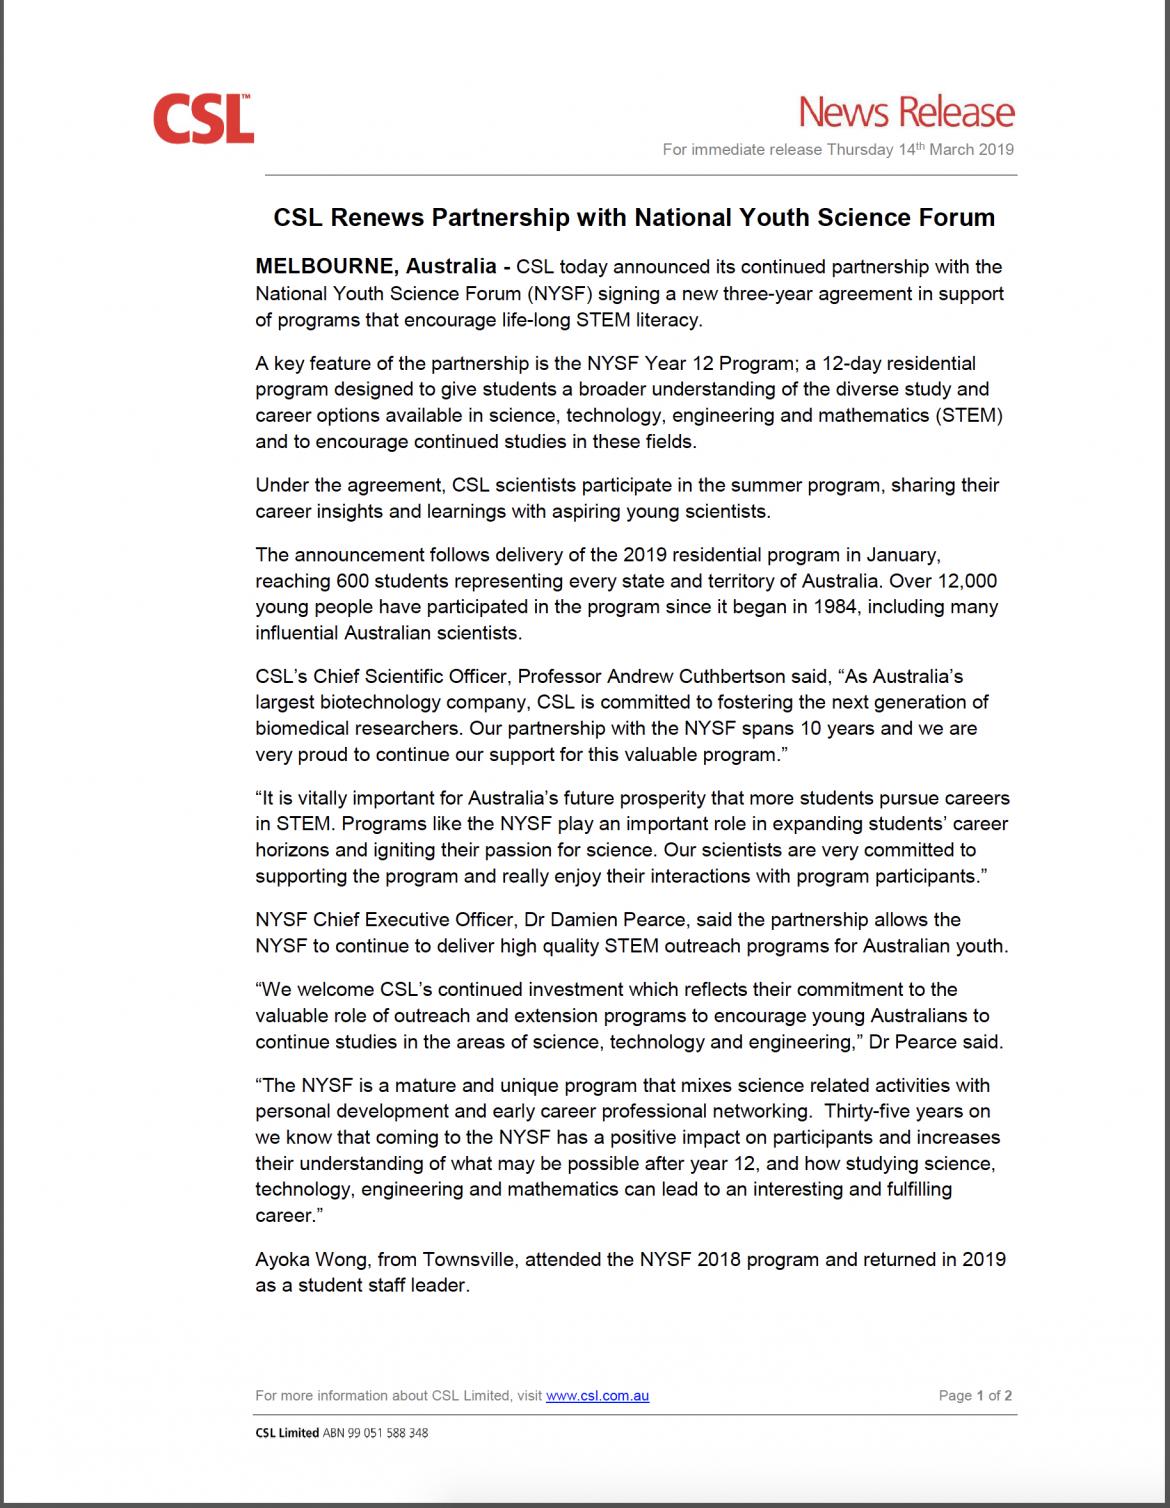 CSL Renews Partnership – Media Release - content image